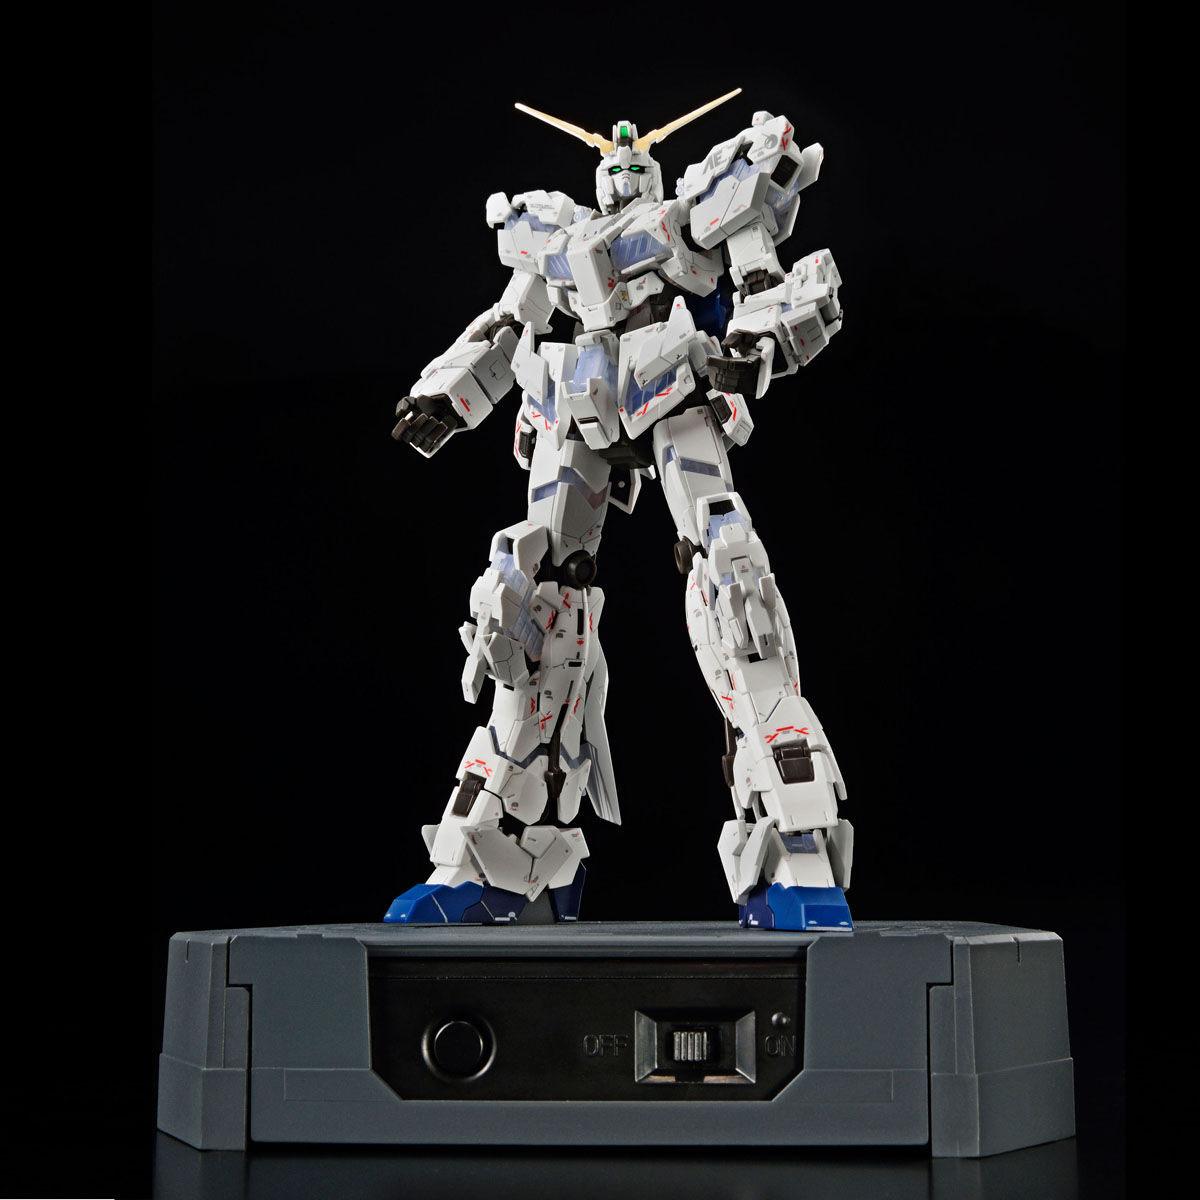 RG 1/144『ガンダムベース限定 RX-0 ユニコーンガンダム(デストロイモード)Ver.TWC(LIGHTING MODEL)』プラモデル-004